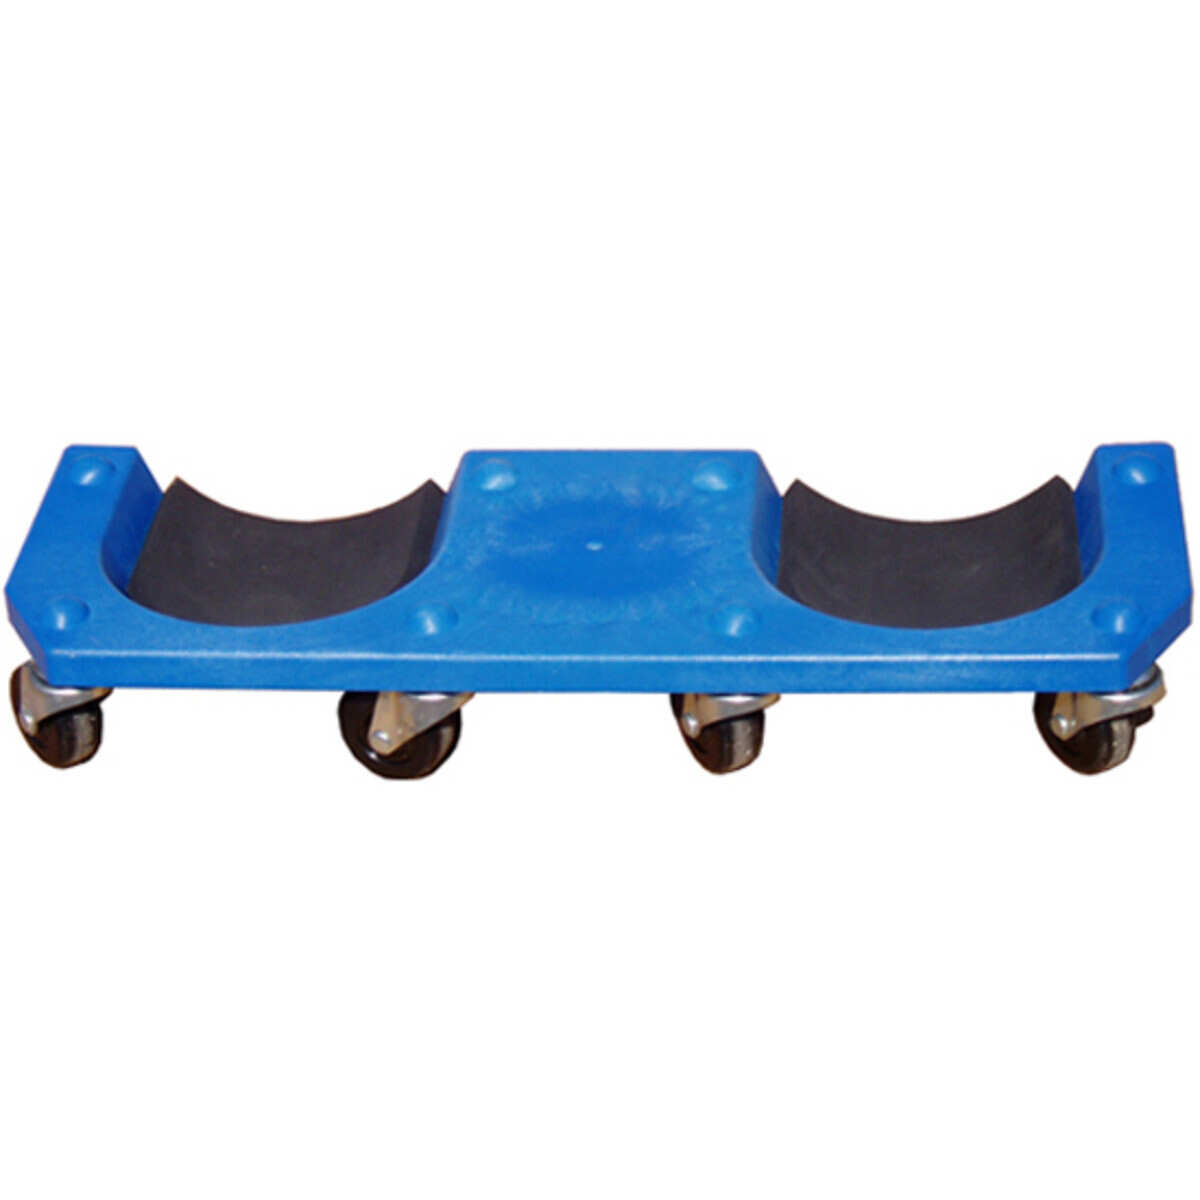 Roller Knee Pads For Flooring